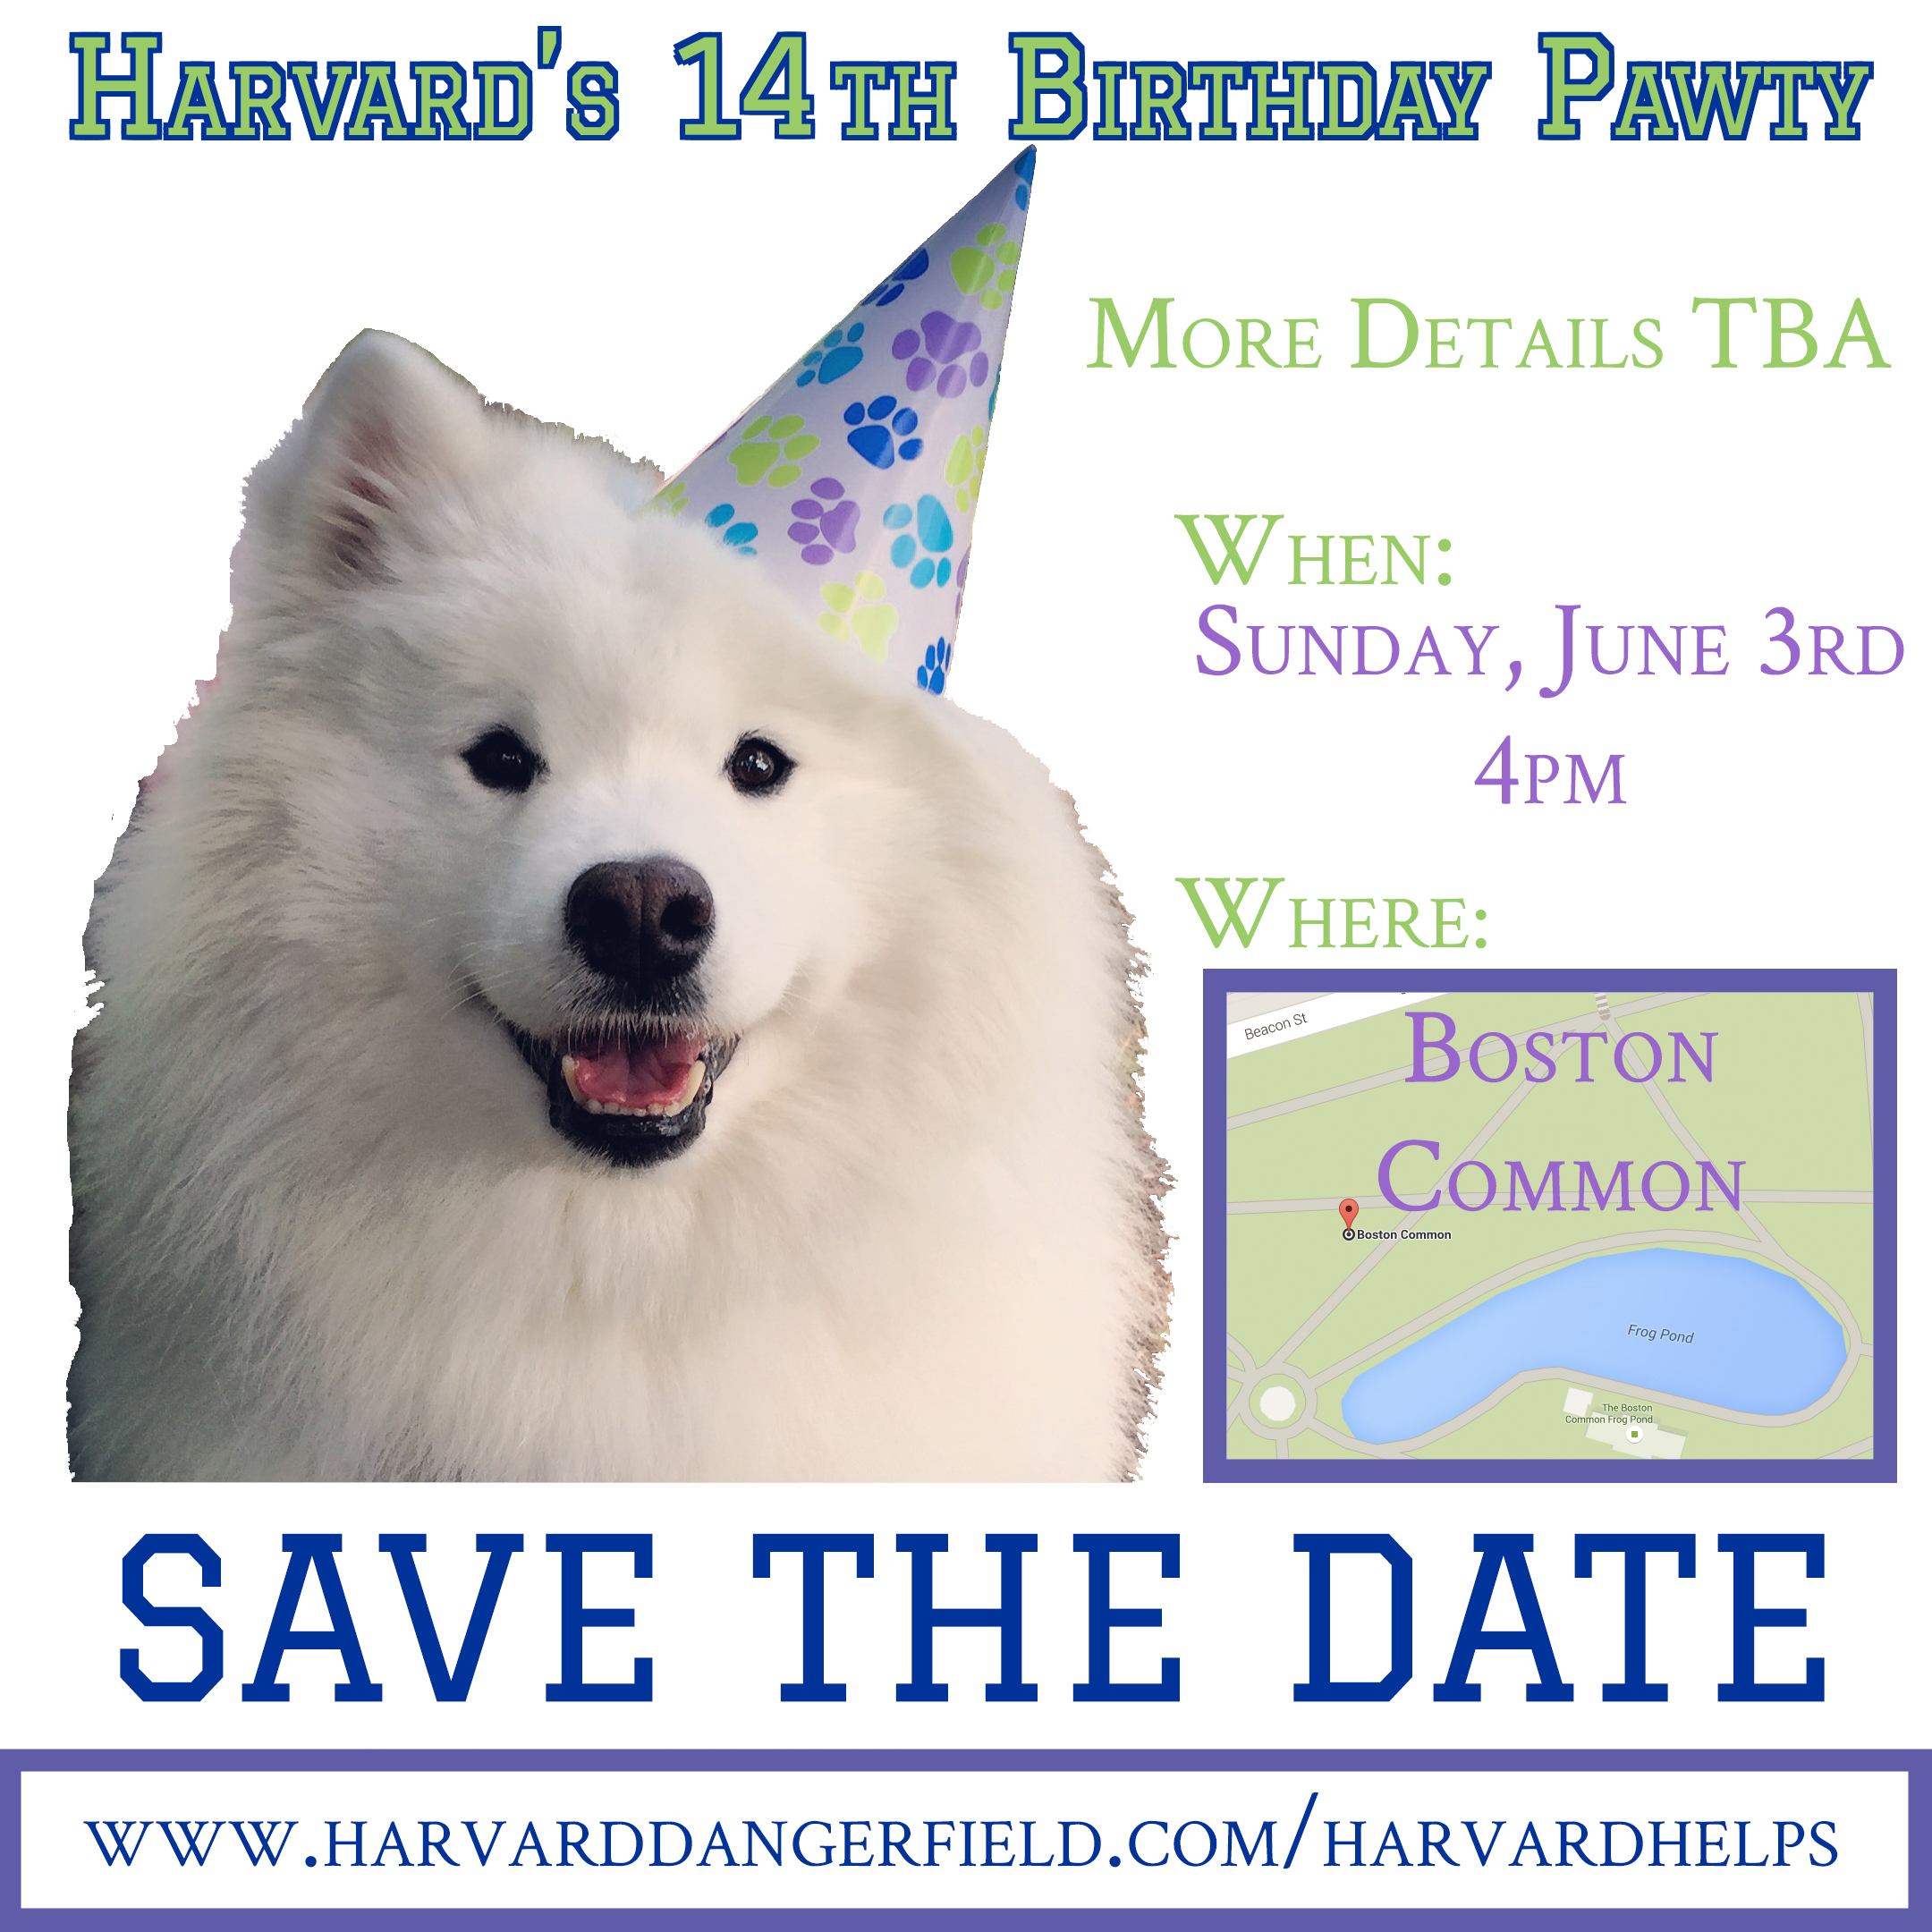 Harvards 14th Save The Date.jpg